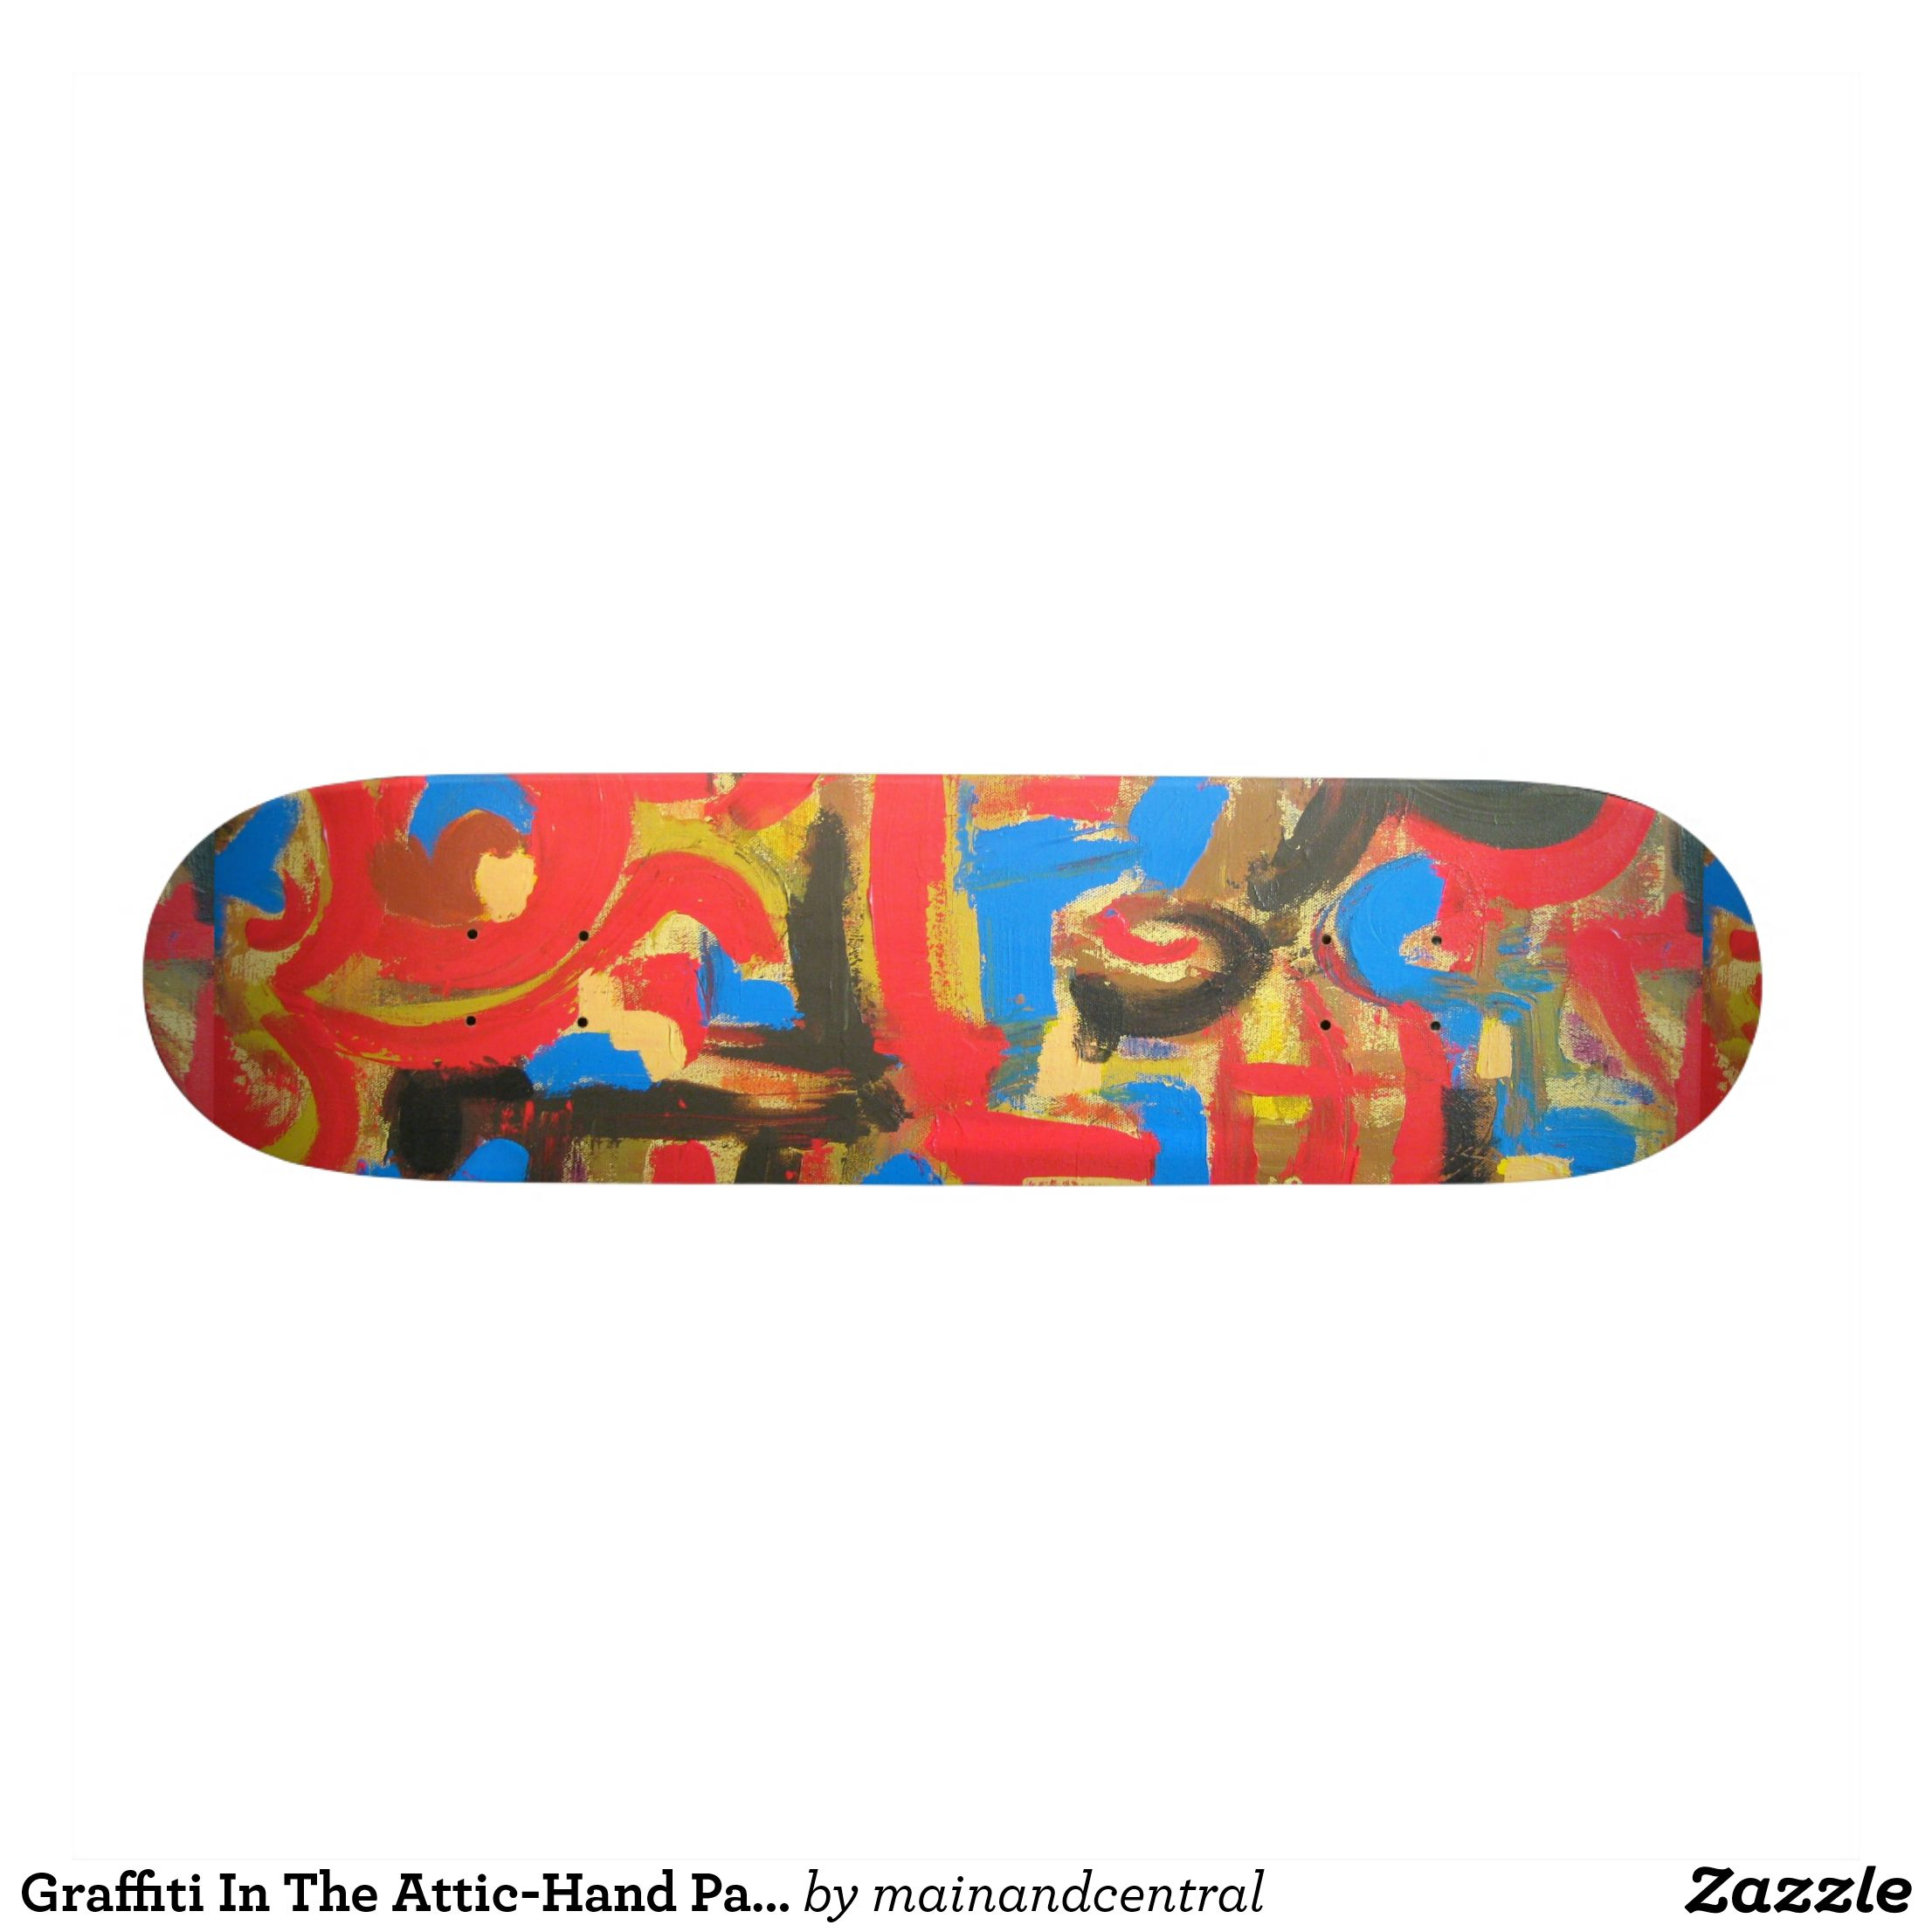 0c9e3f8e6e6 Graffiti In The Attic-Hand Painted Abstract Art Skateboard - Supreme  Hard-Rock Maple Deck Custom Boards By Talented Fashion   Graphic Designers  -  skating ...